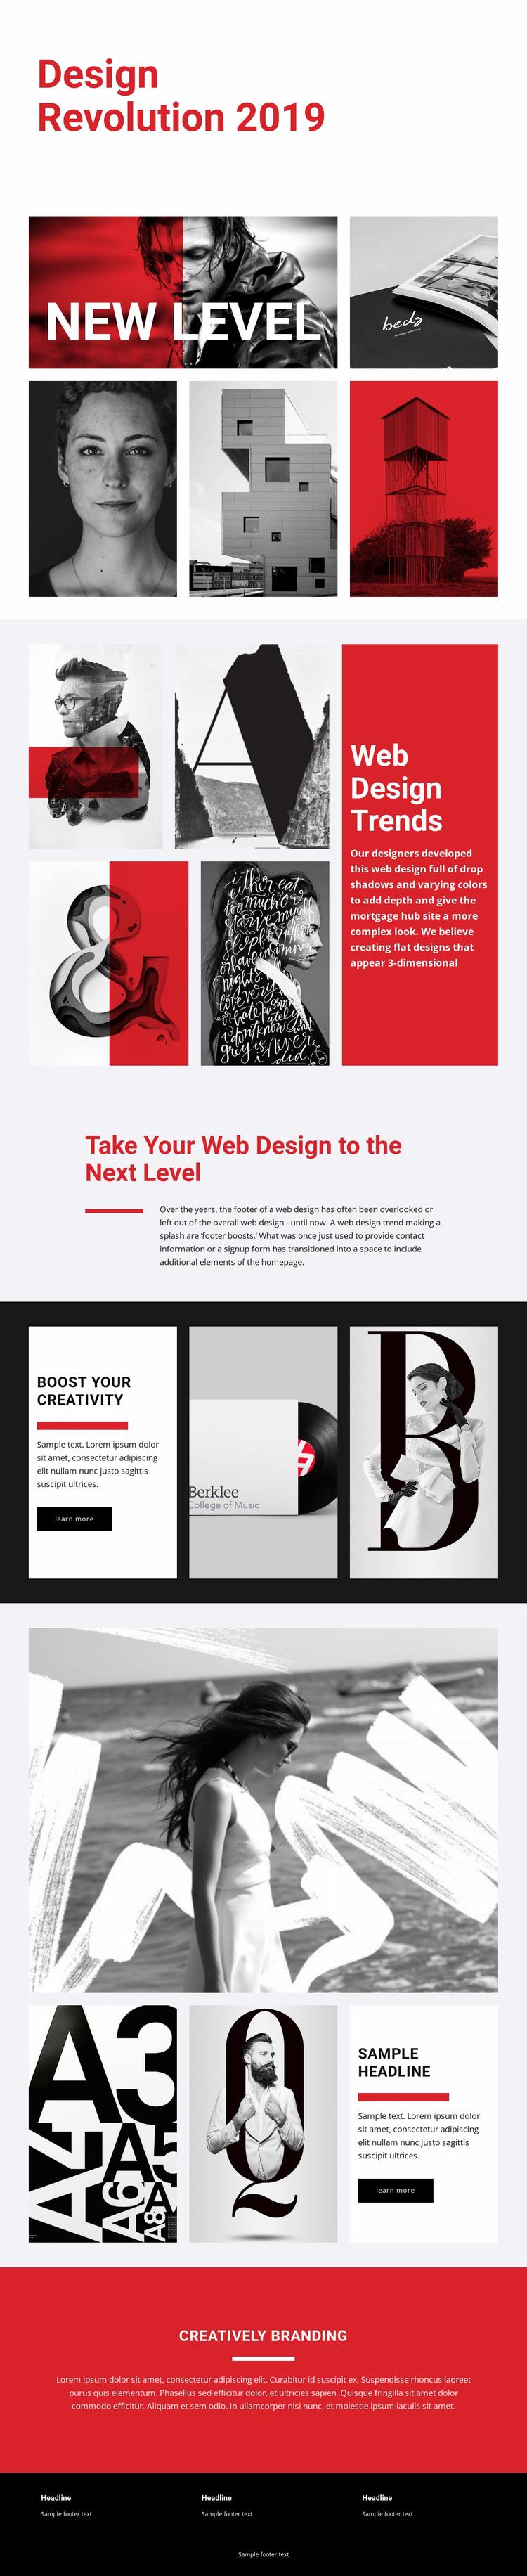 Revolution of designing art Website Design